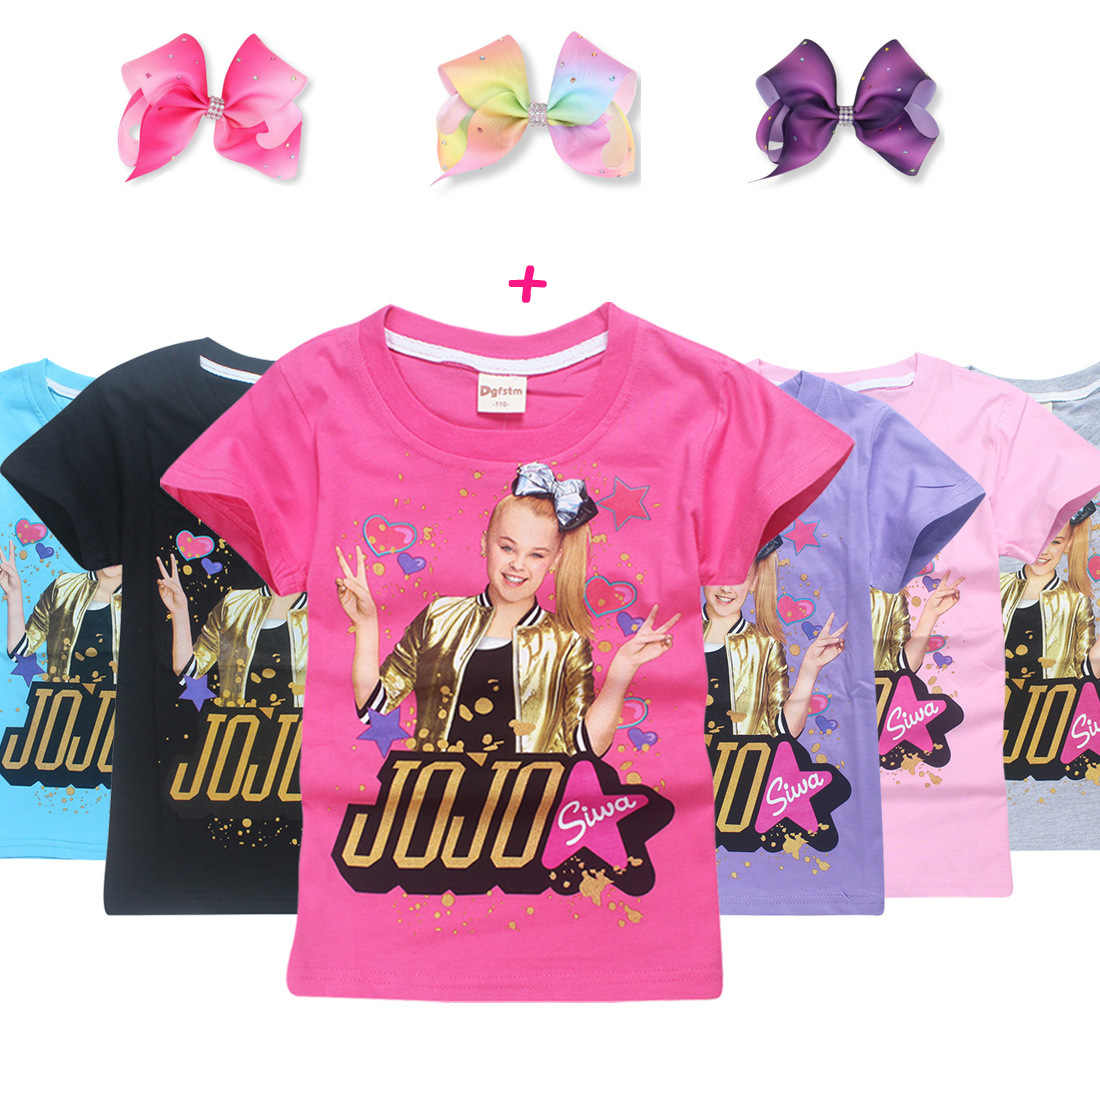 32ed5b024c07b 2018 New Children Summer t shirt girls boys Clothes jojo siwa Clothing  Short Sleeve T-